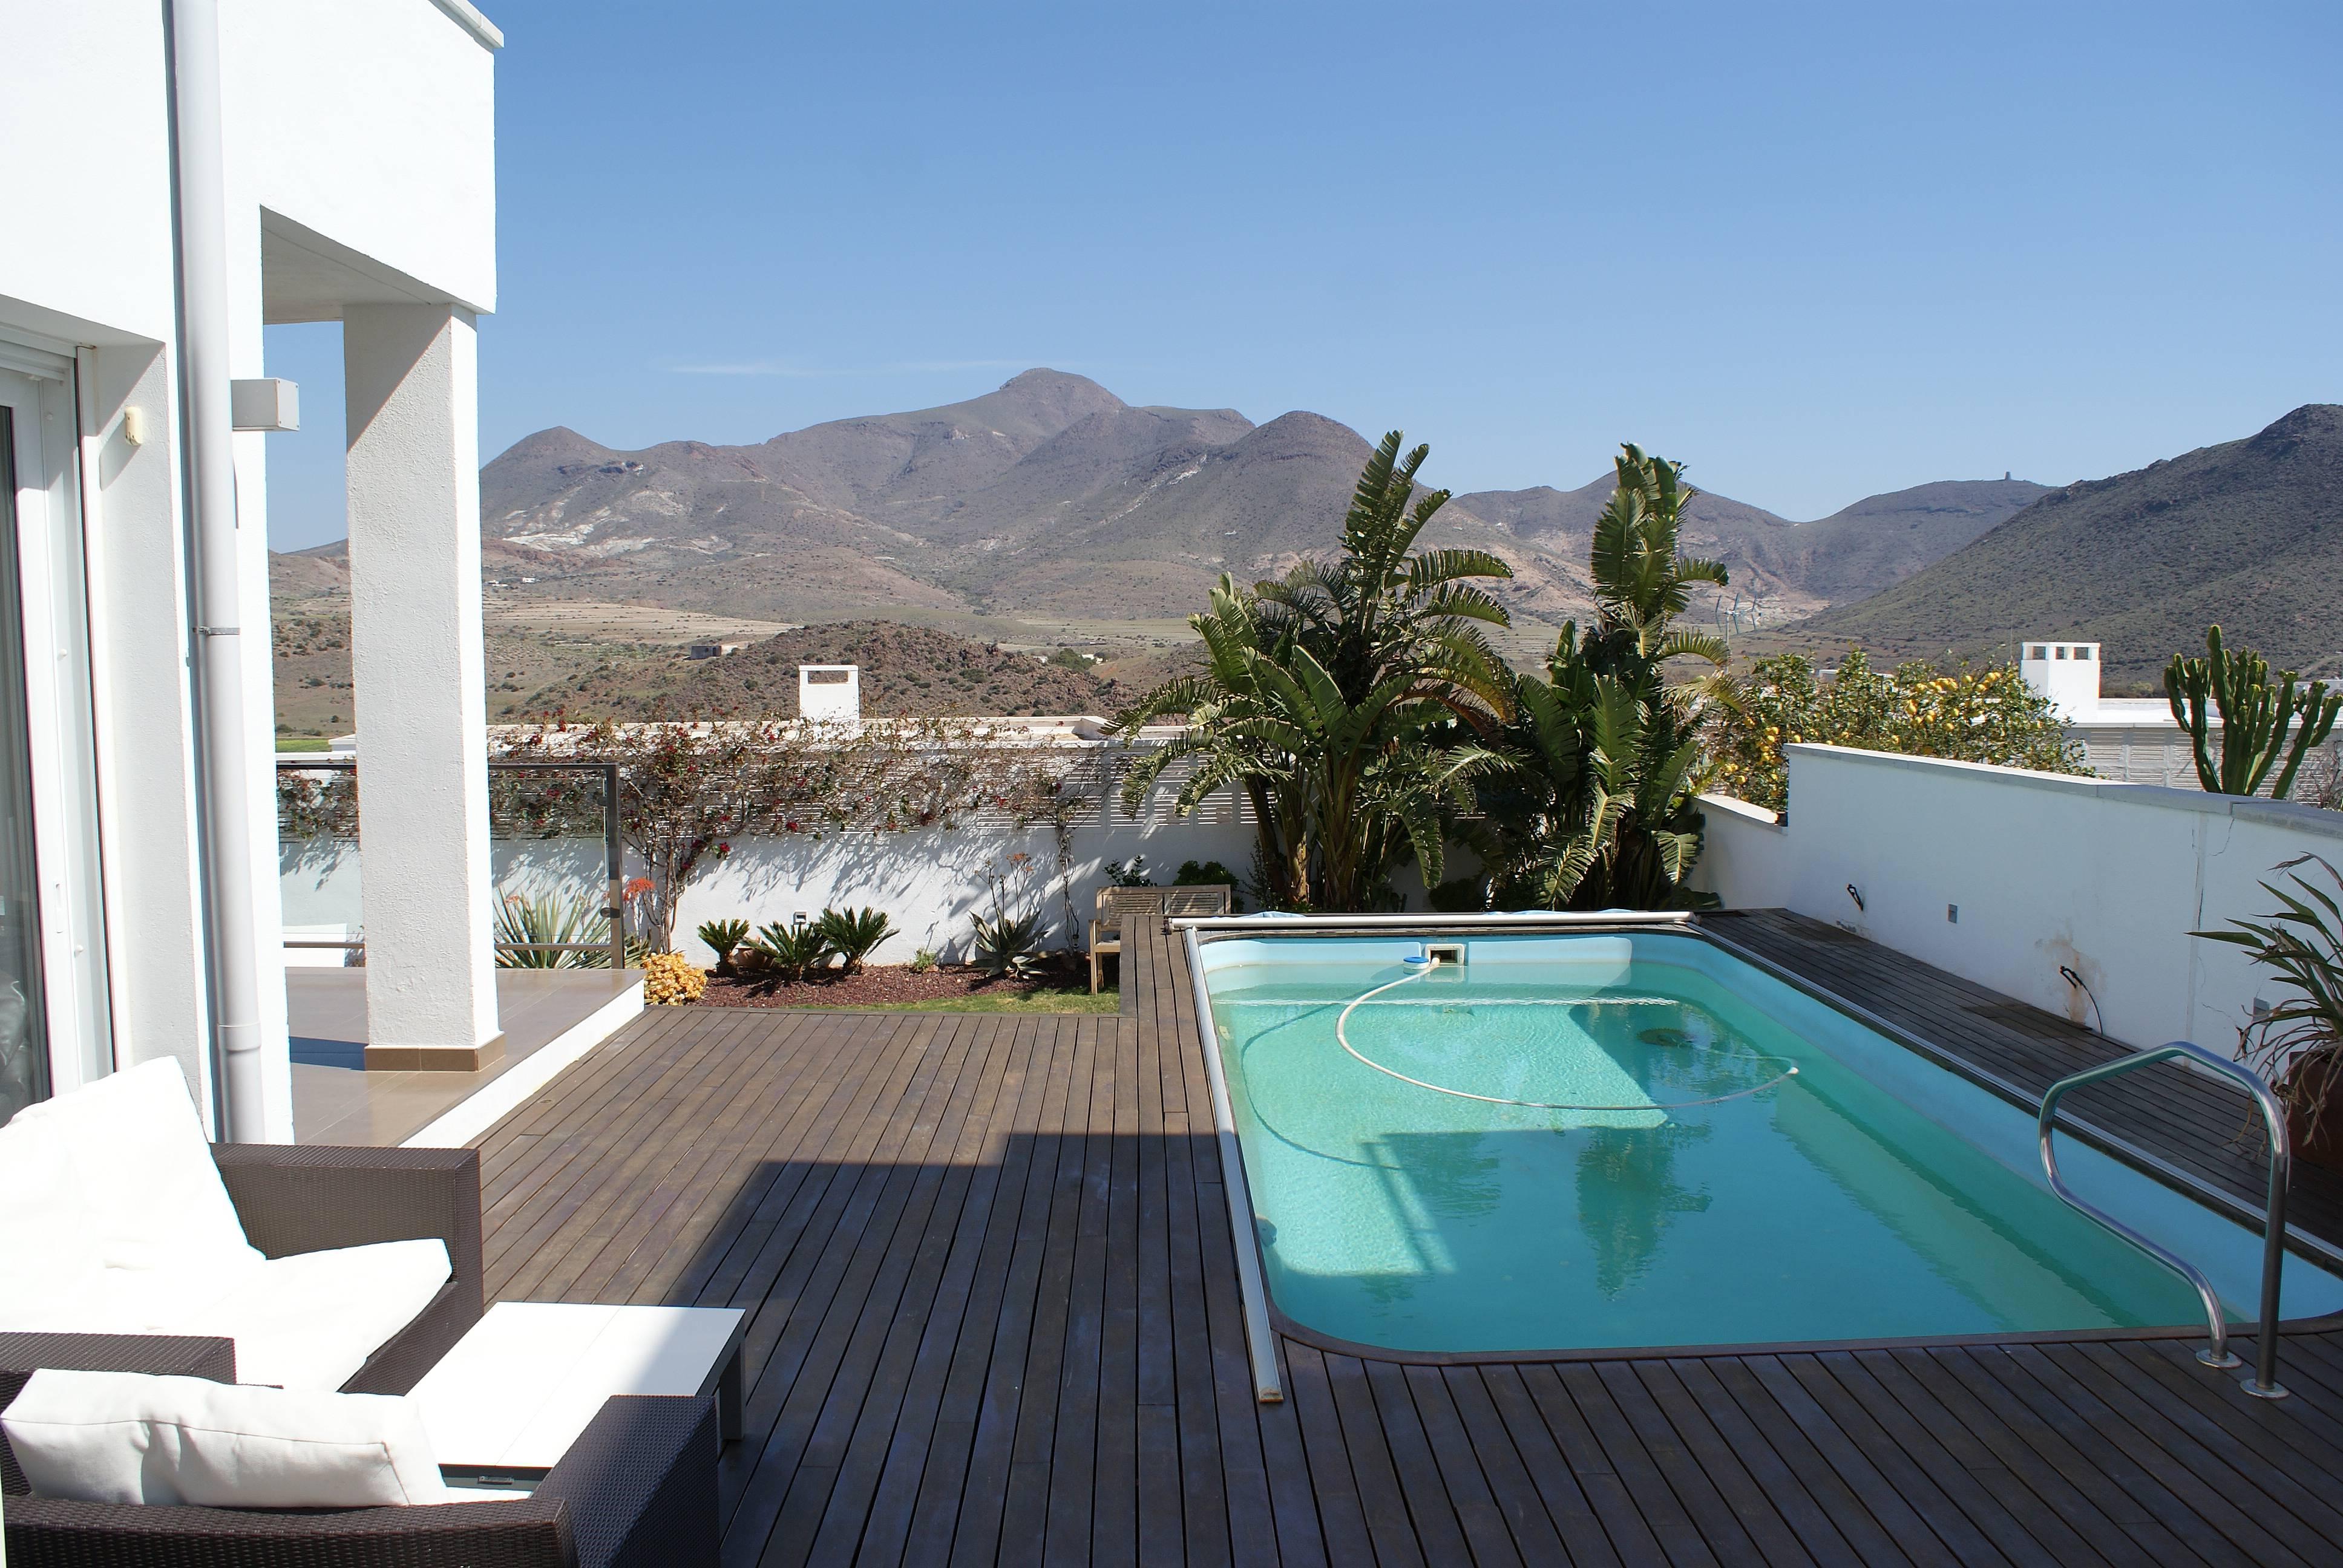 Villas en cabo de gata - Alquiler de casas en san jose almeria ...